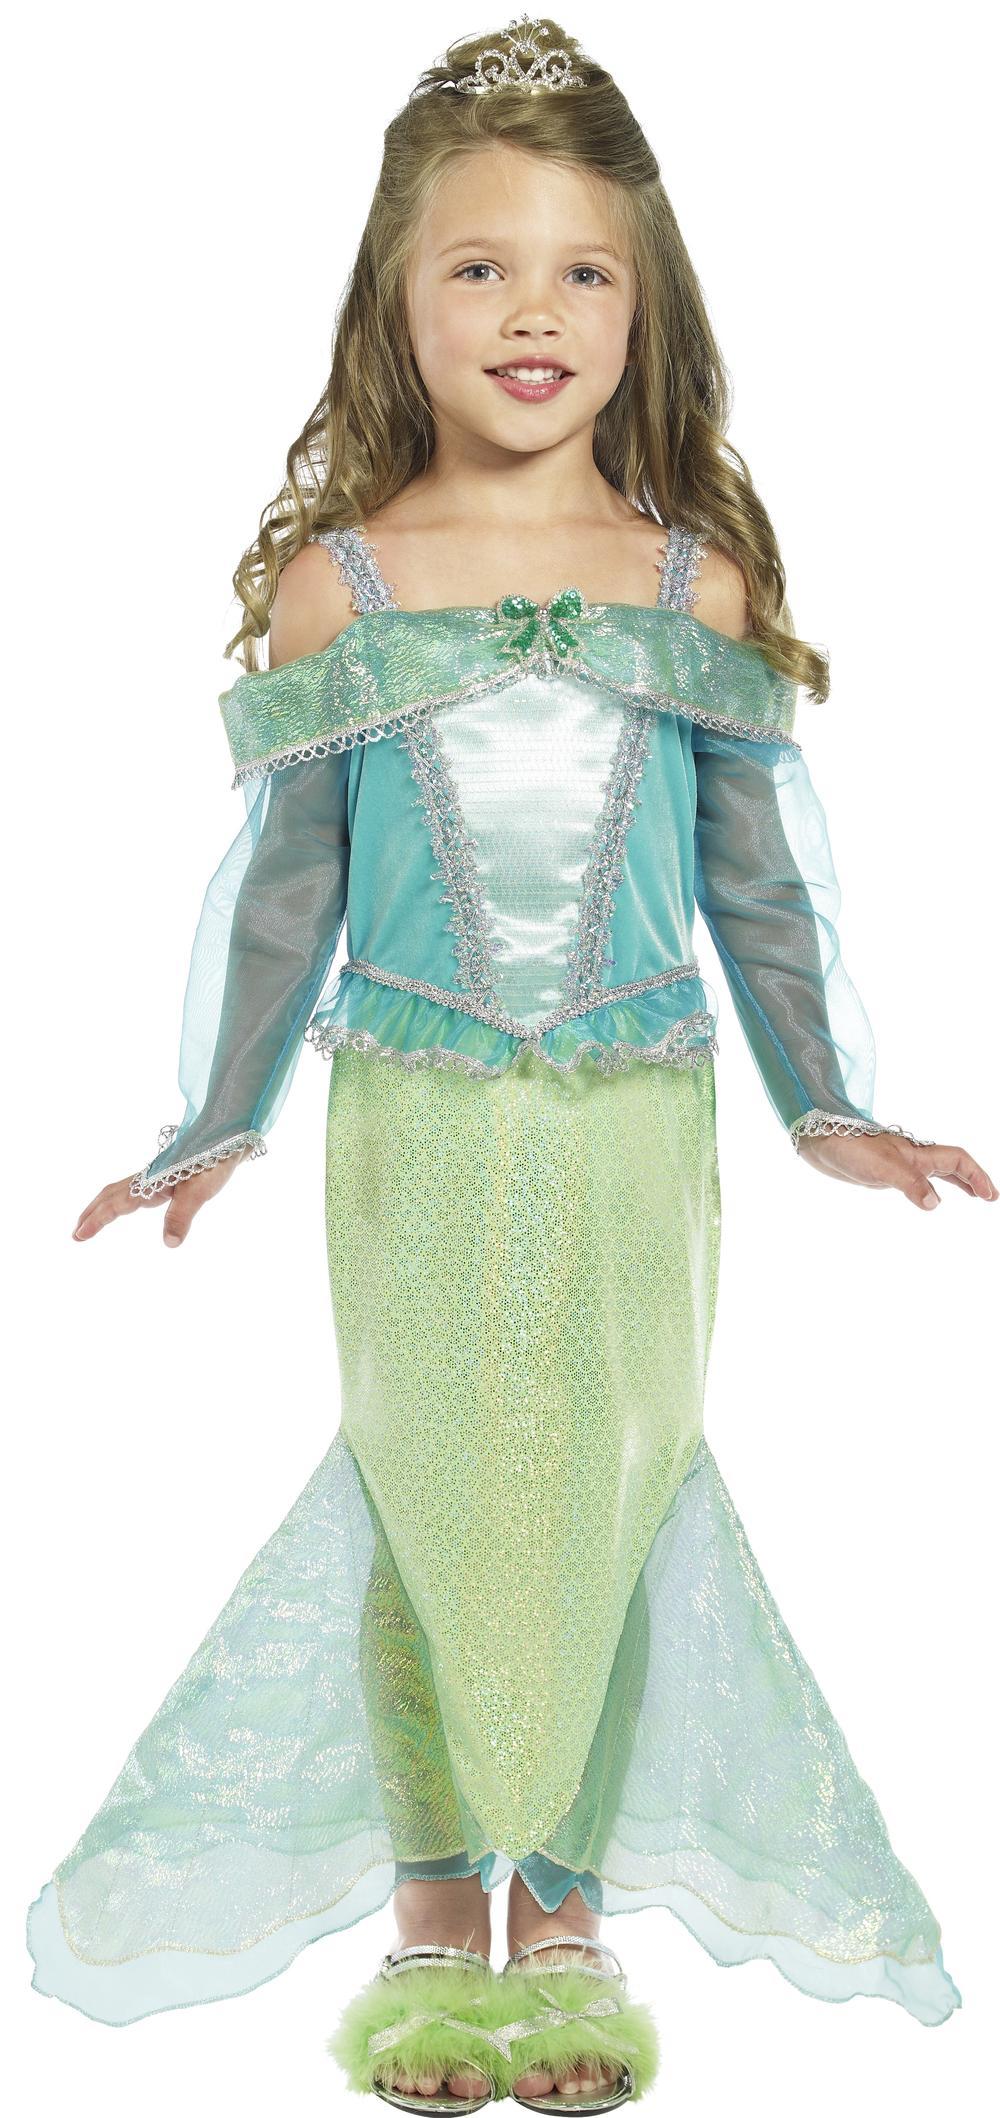 The Little Mermaid Princess Fancy Dress Girls Book Character Kids Childs Costume